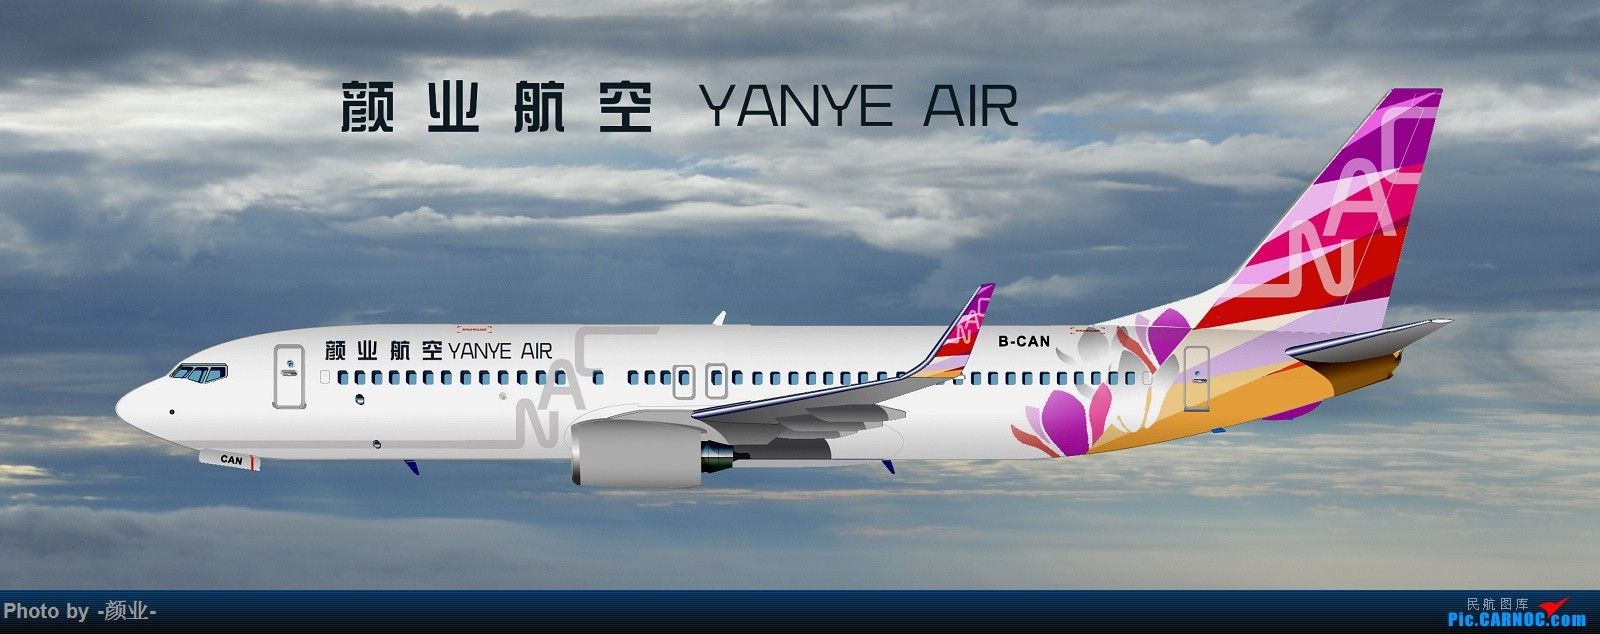 Re:[原创]走近飞机起降点(无尽创意) BOEING 737-700 B-CAN 中国广州白云国际机场